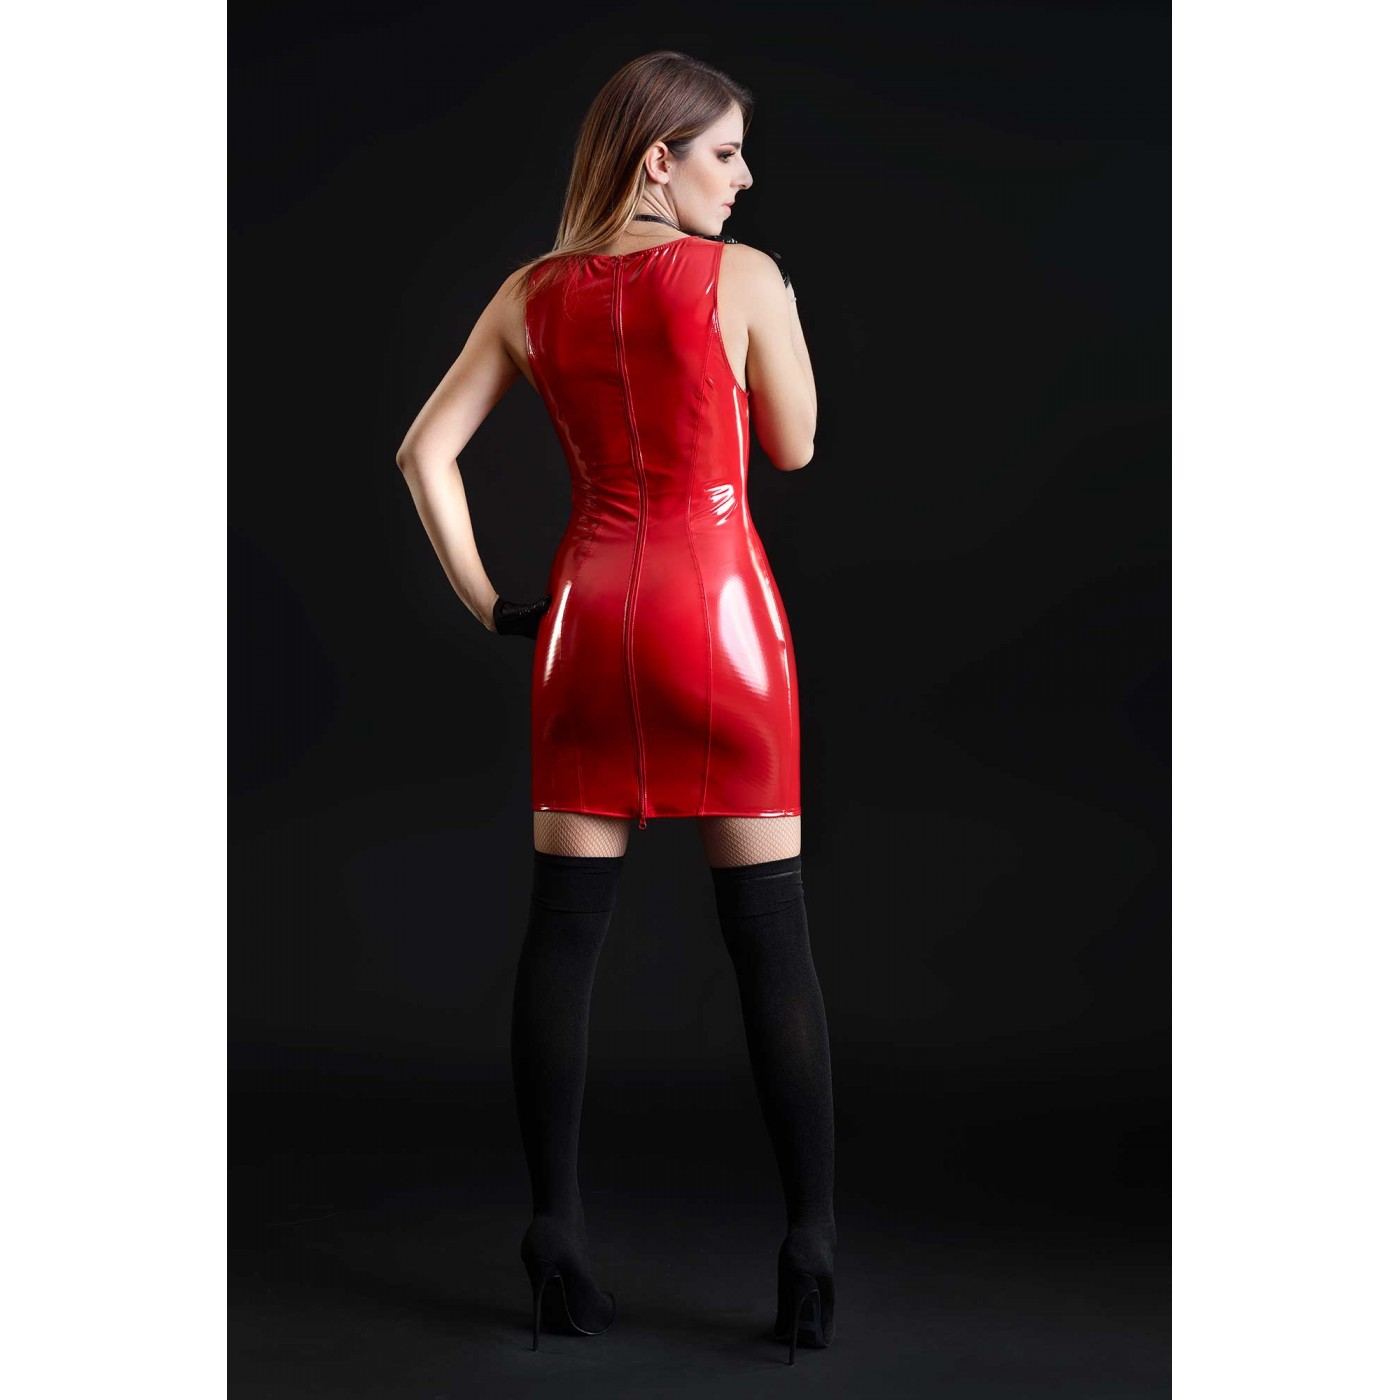 Emmanuelle, robe sexy vinyle rouge - Patrice Catanzaro